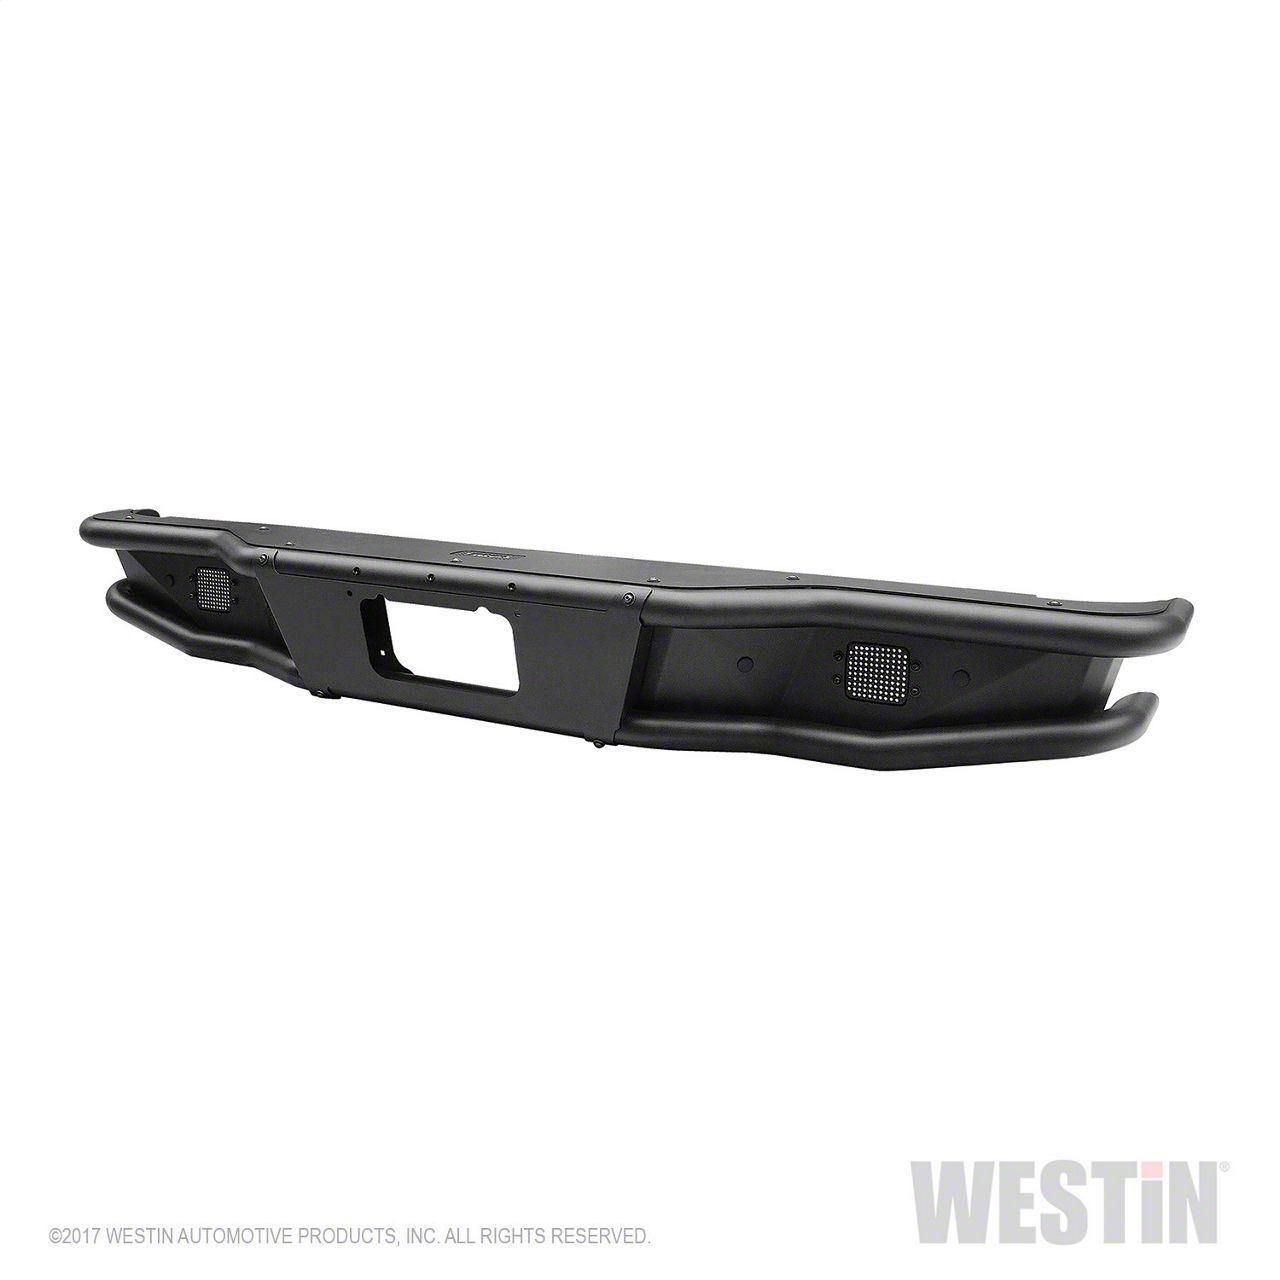 Westin Outlaw Rear Bumper - Textured Black (16-18 Silverado 1500)